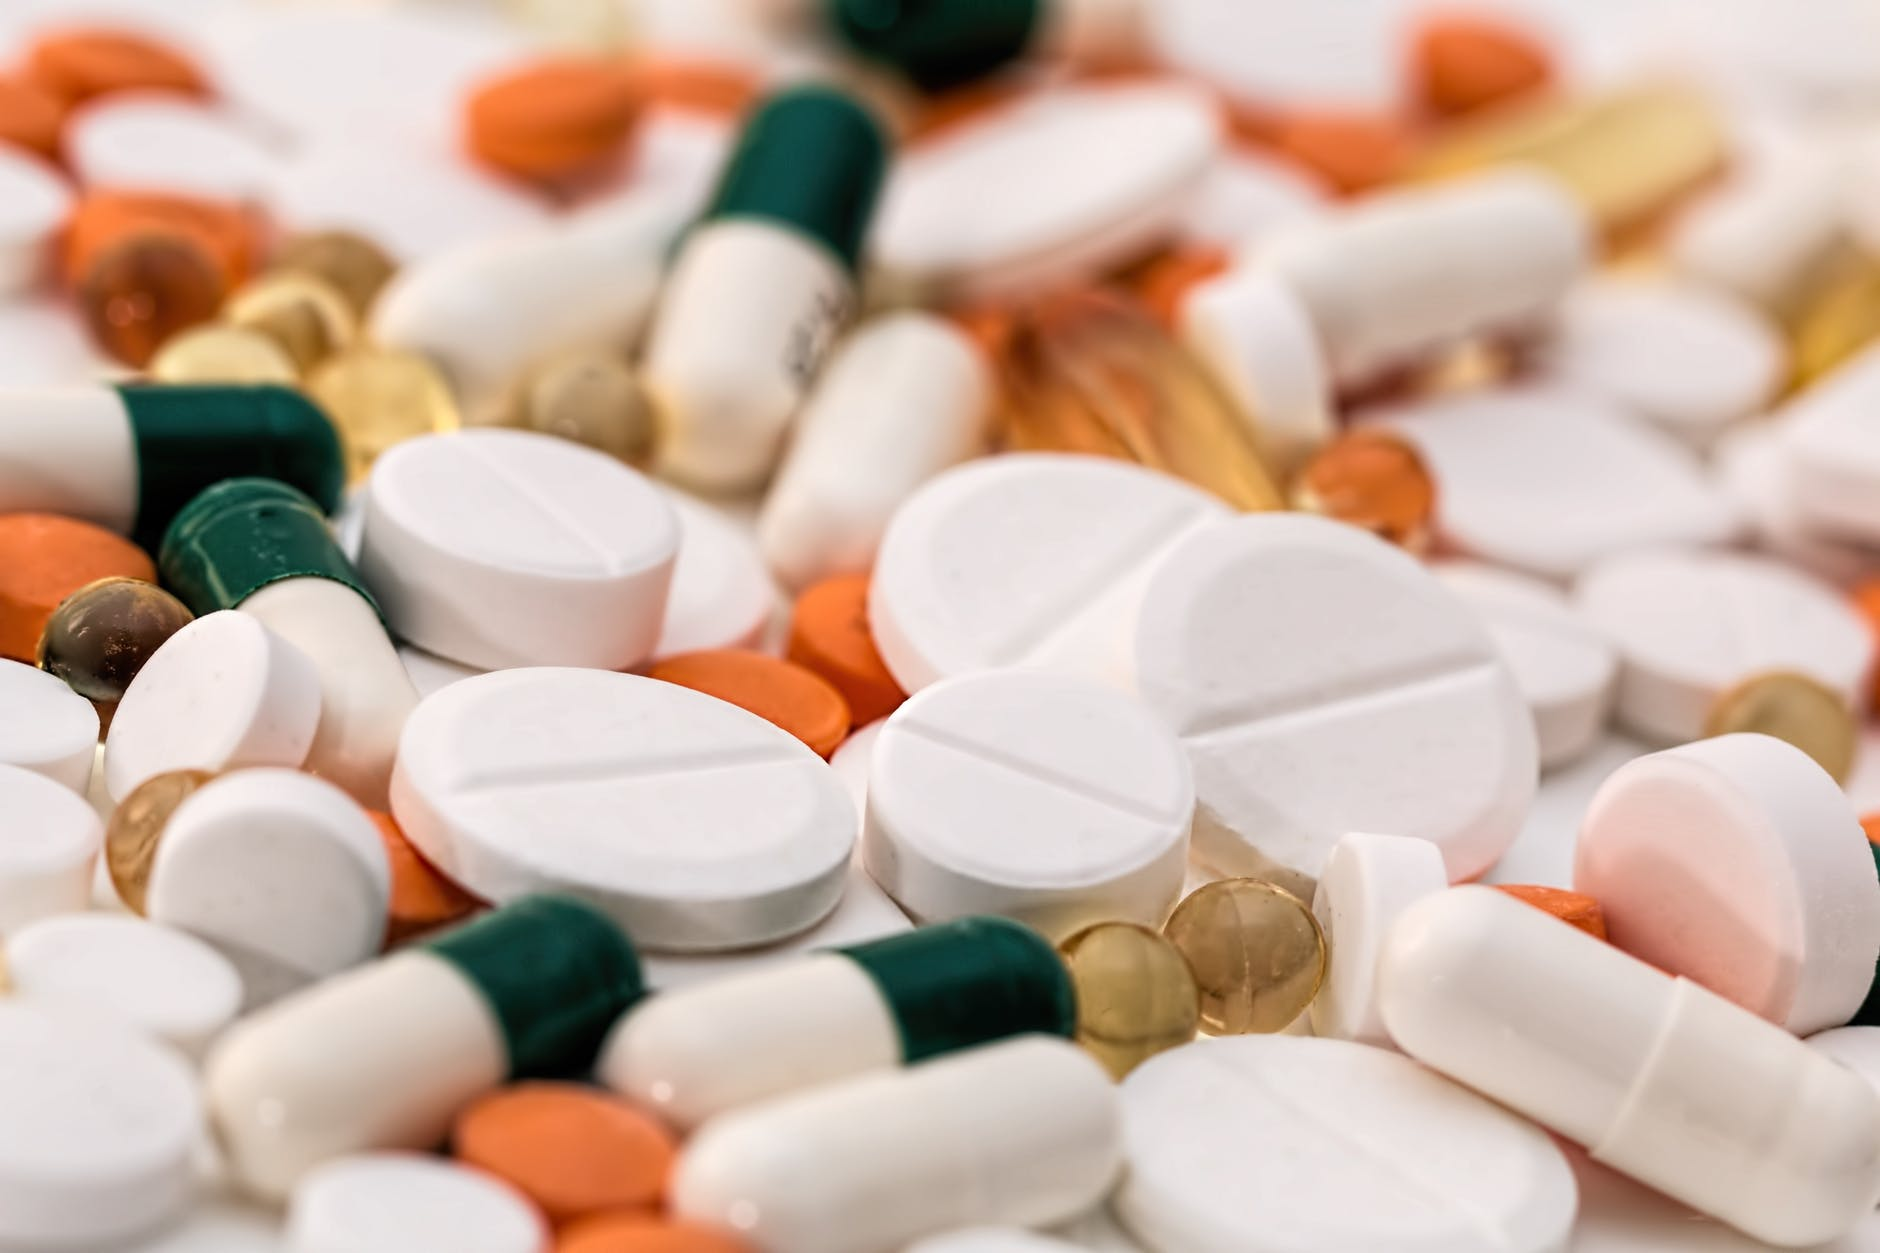 close up photo of medicinal drugs